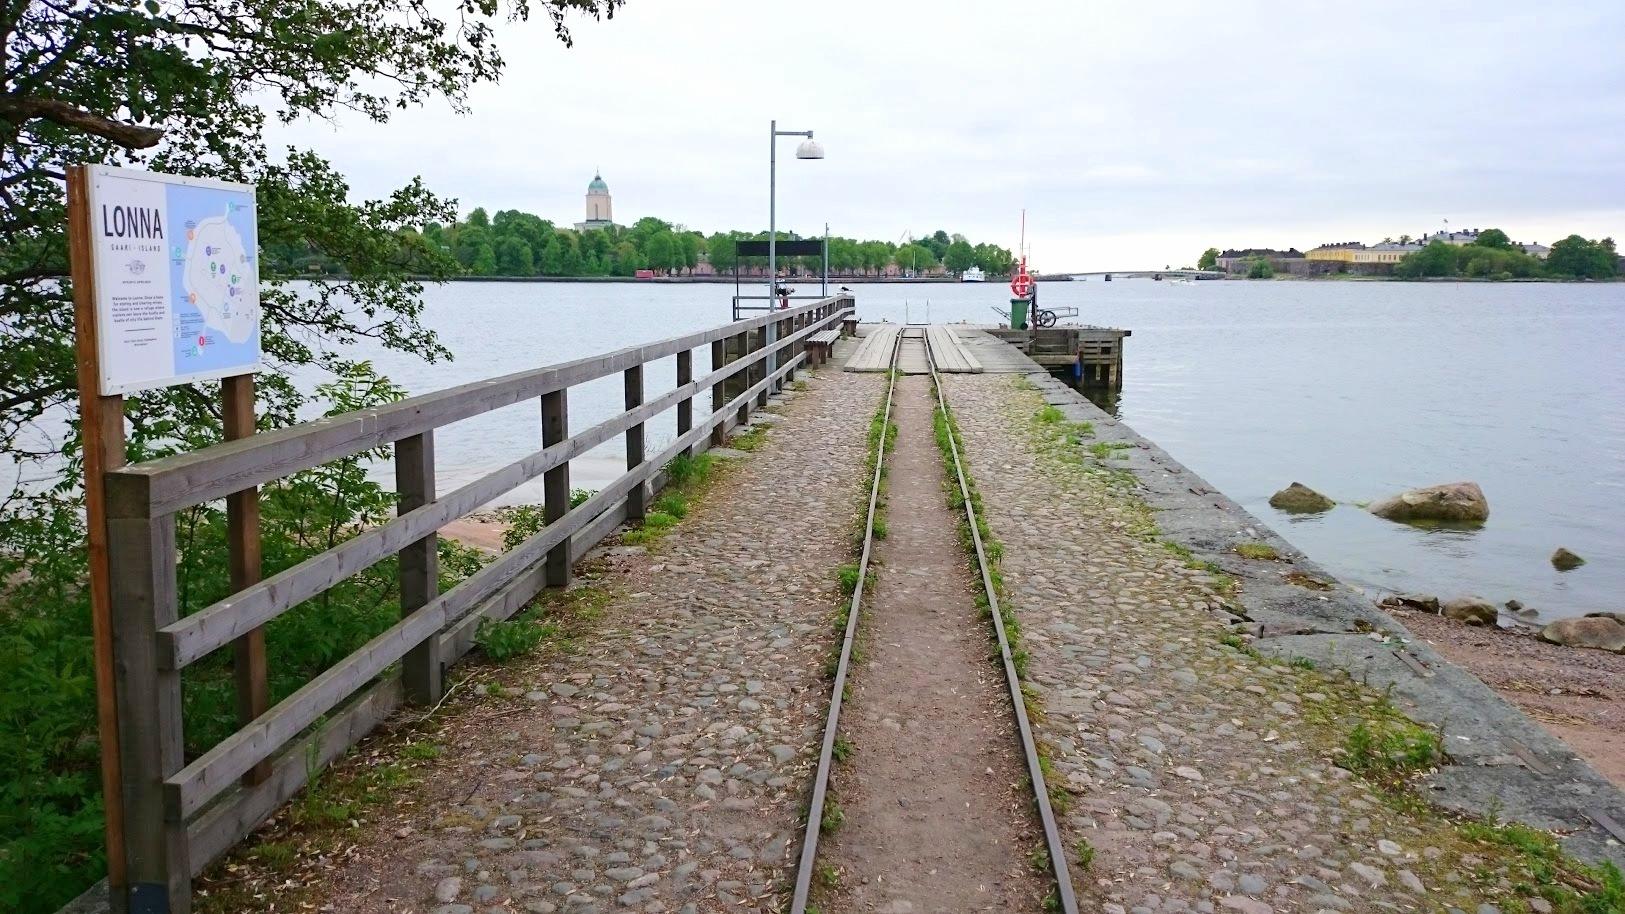 Lonna Suomenlinna